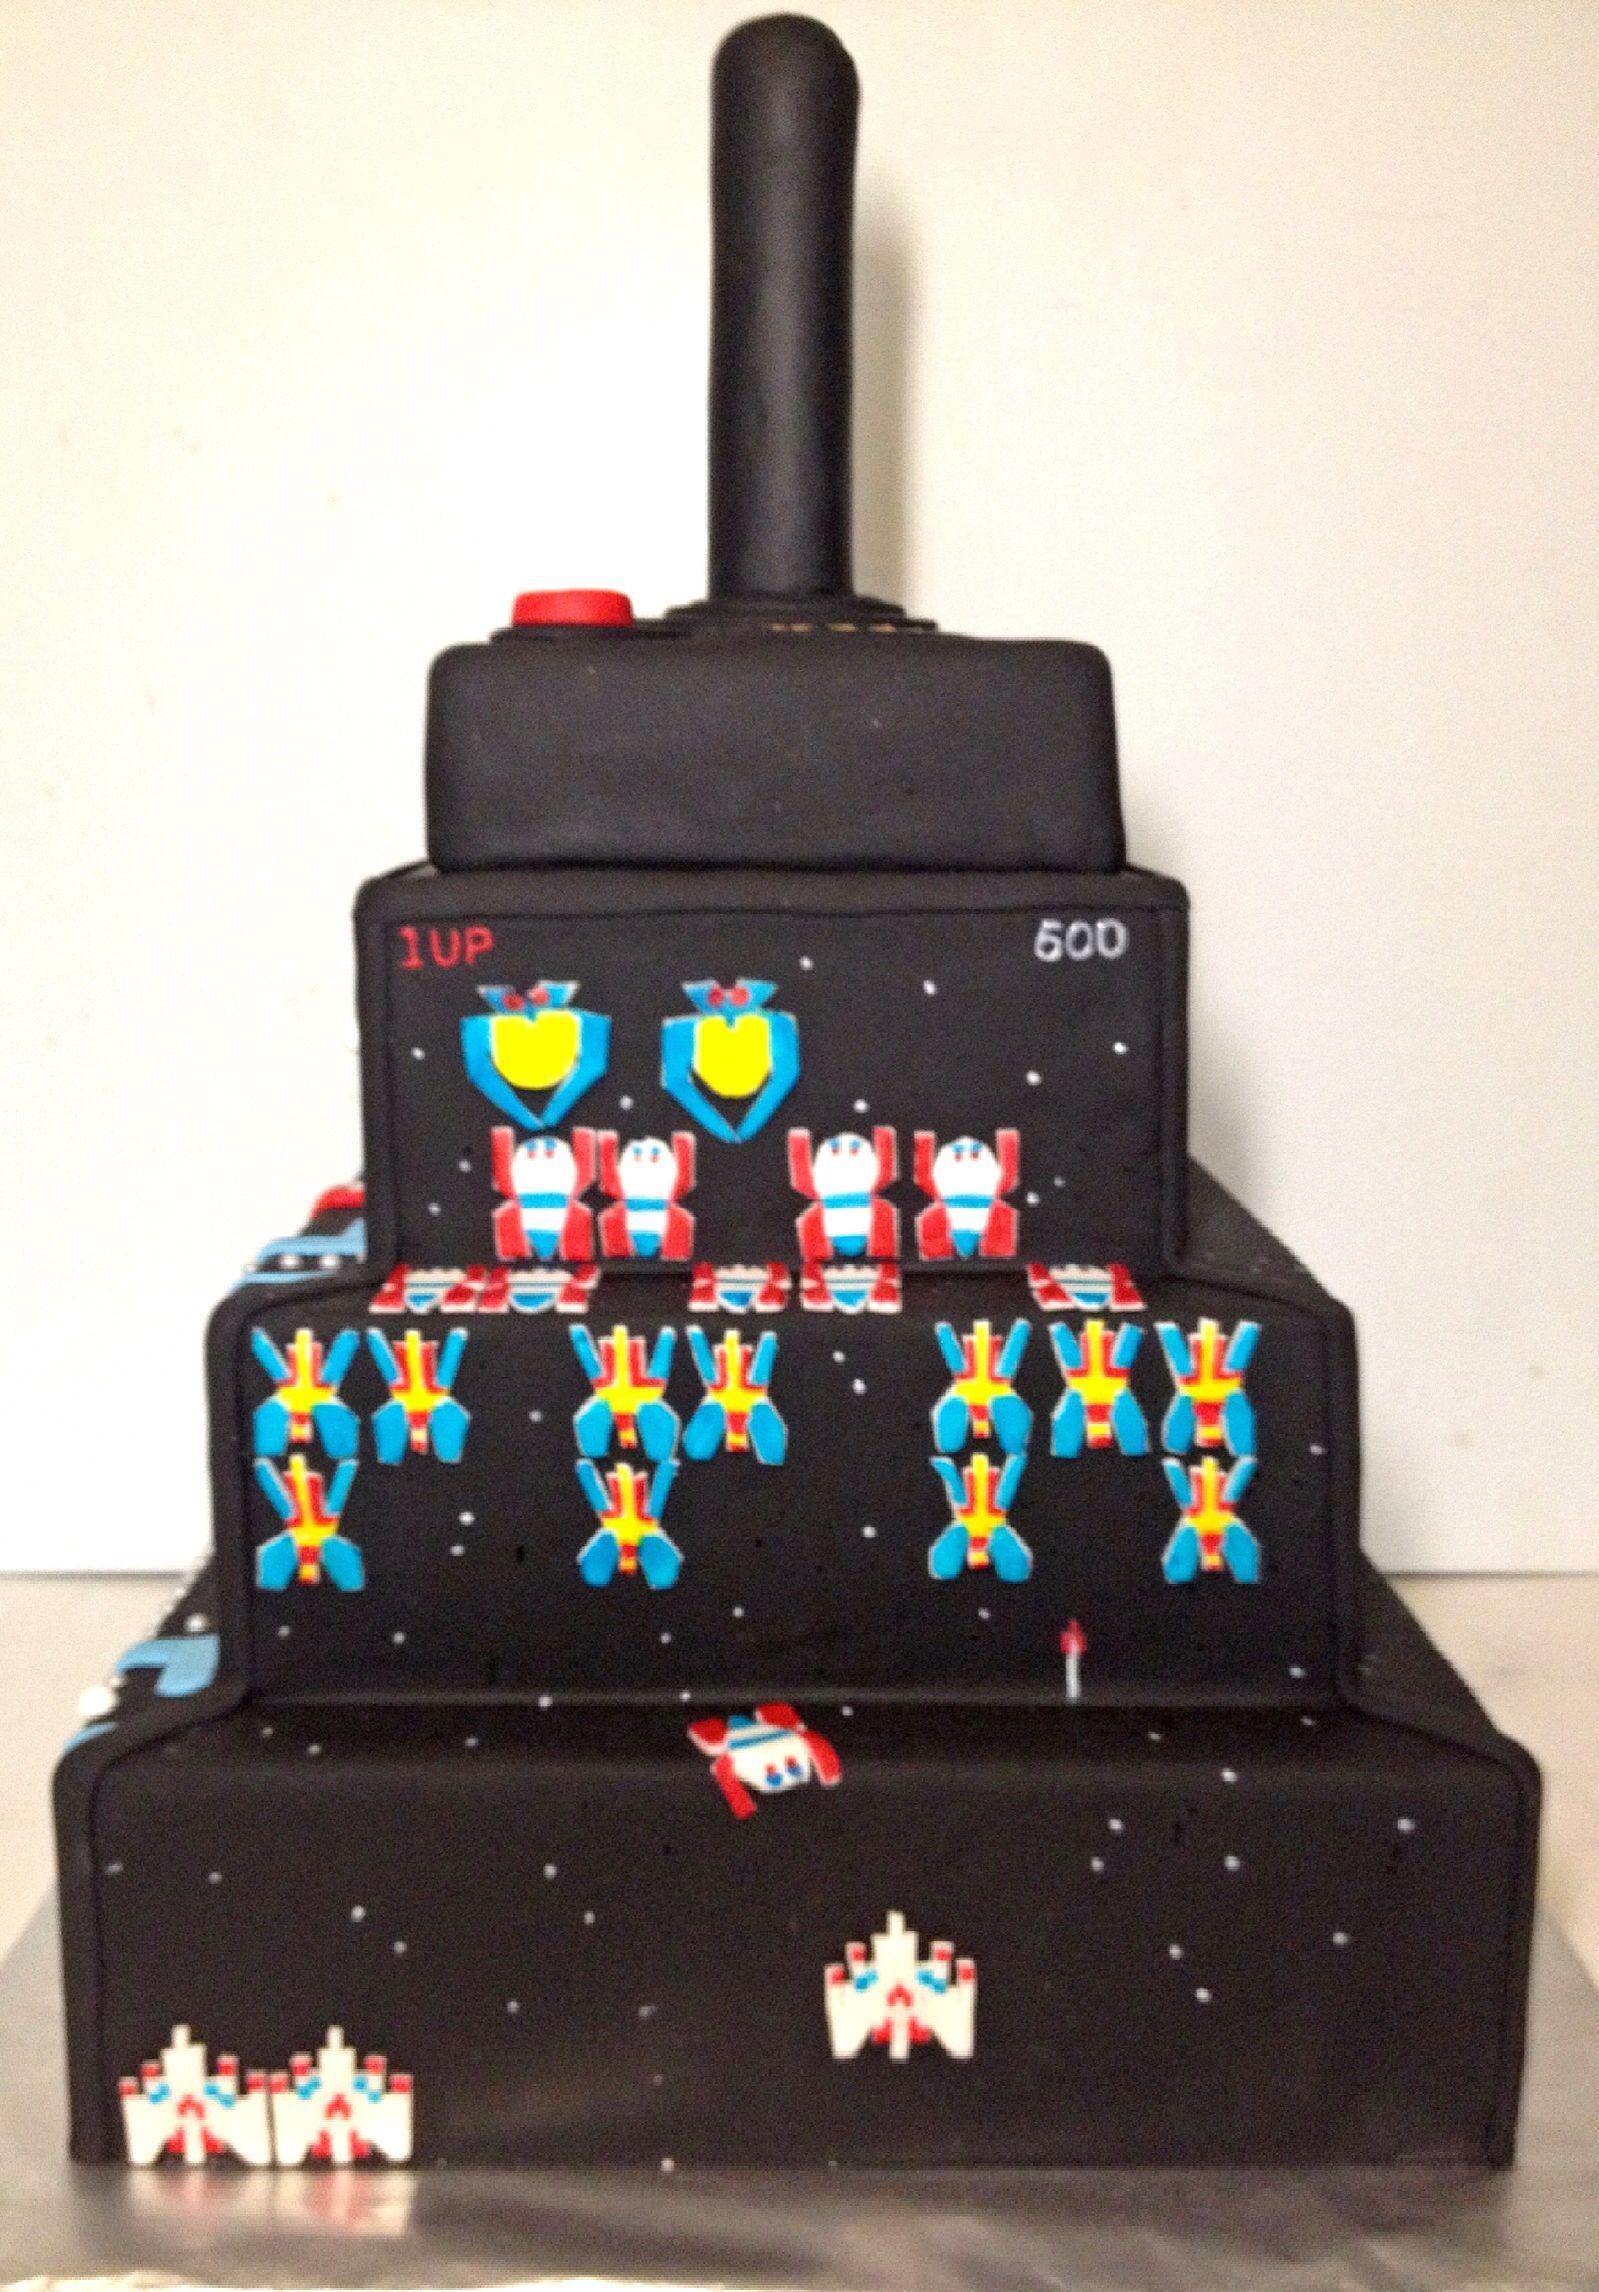 Incredible Retro Arcade Cake Galaga With Images Video Game Cakes Arcade Funny Birthday Cards Online Alyptdamsfinfo